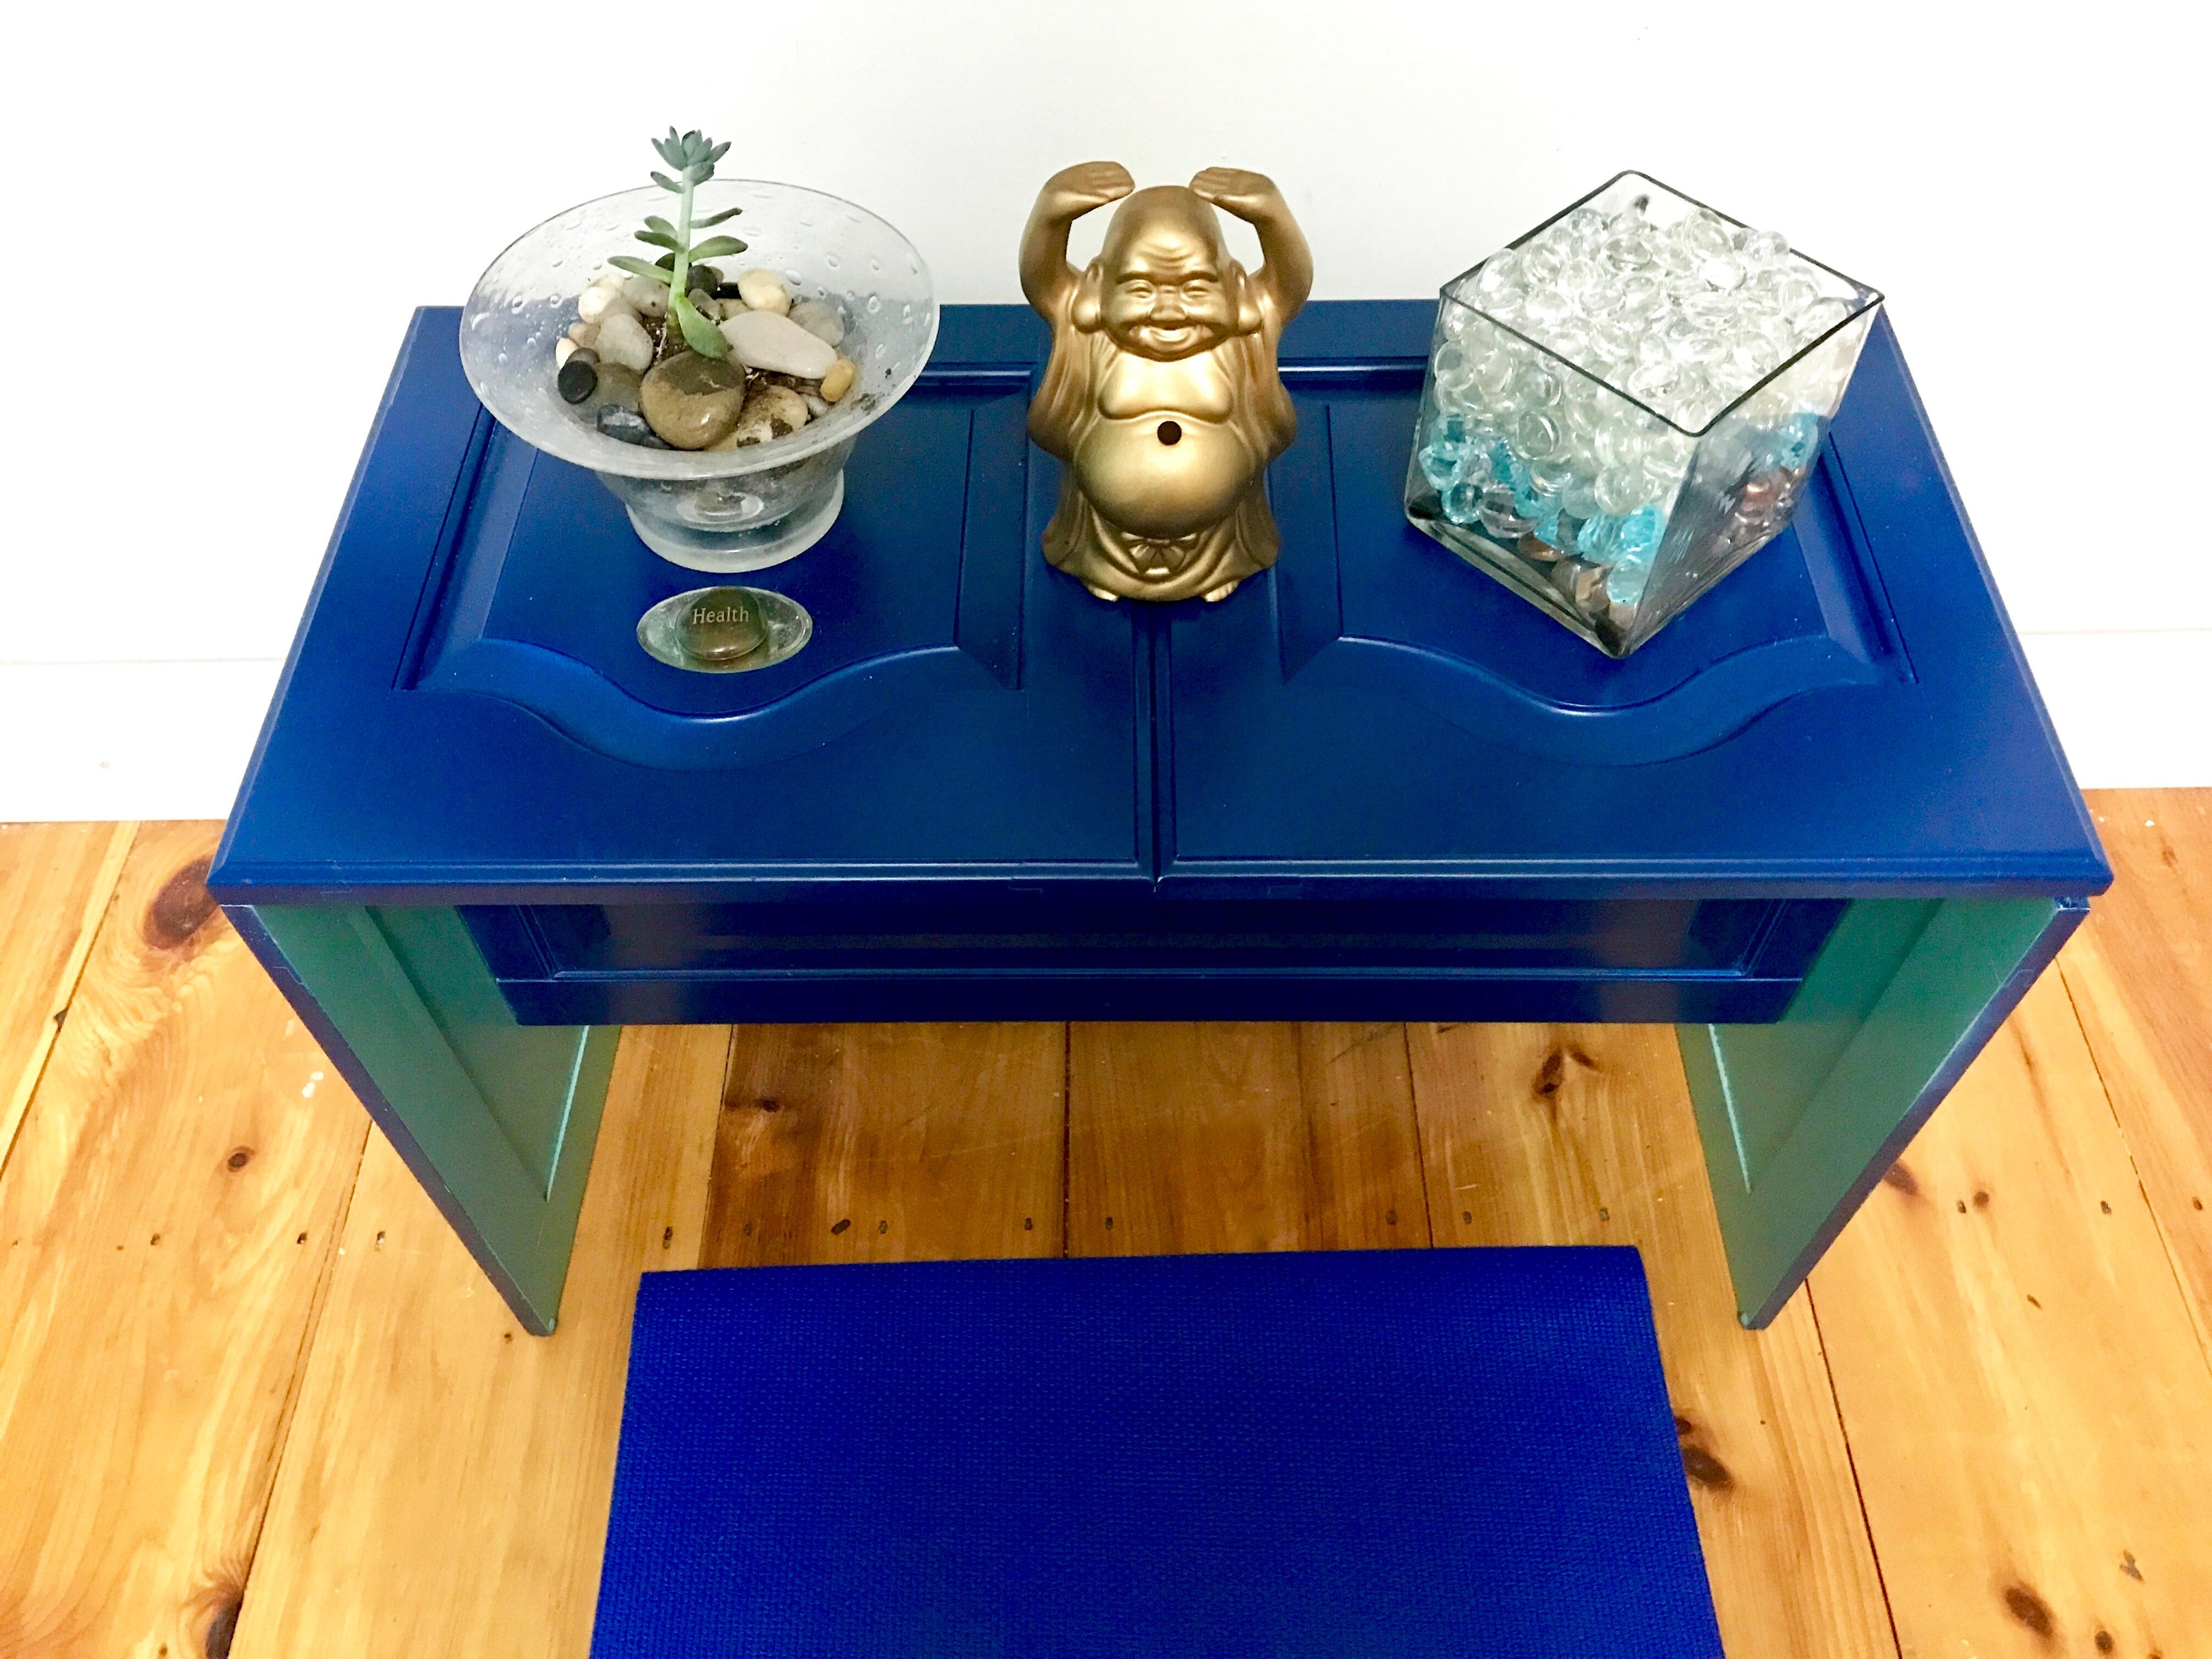 11b Krylon MyFixitUpLife Meditation Space bench decorated